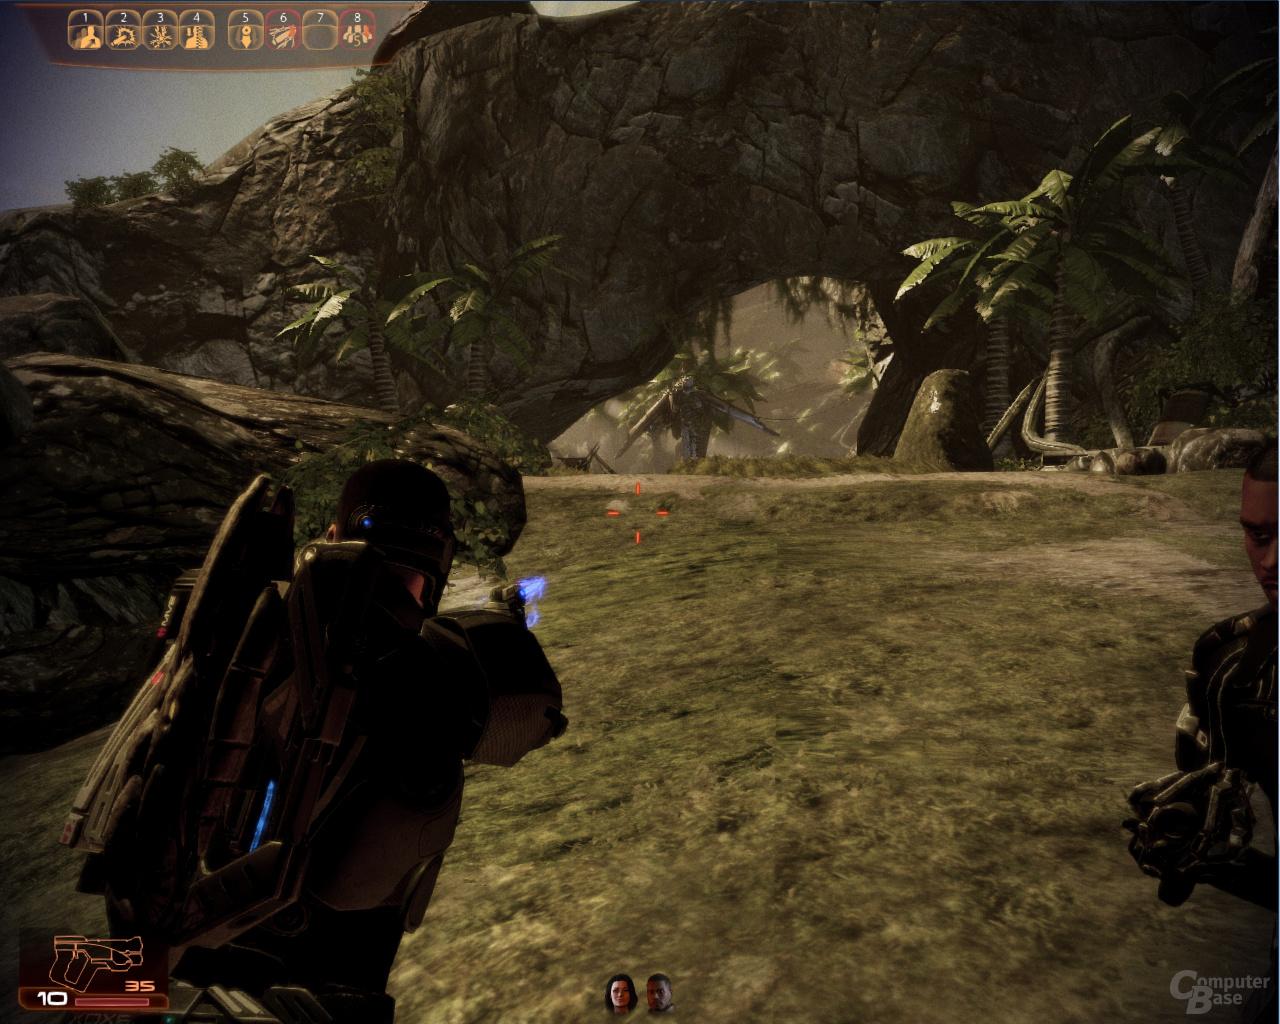 Mass Effect 2 - MLAA